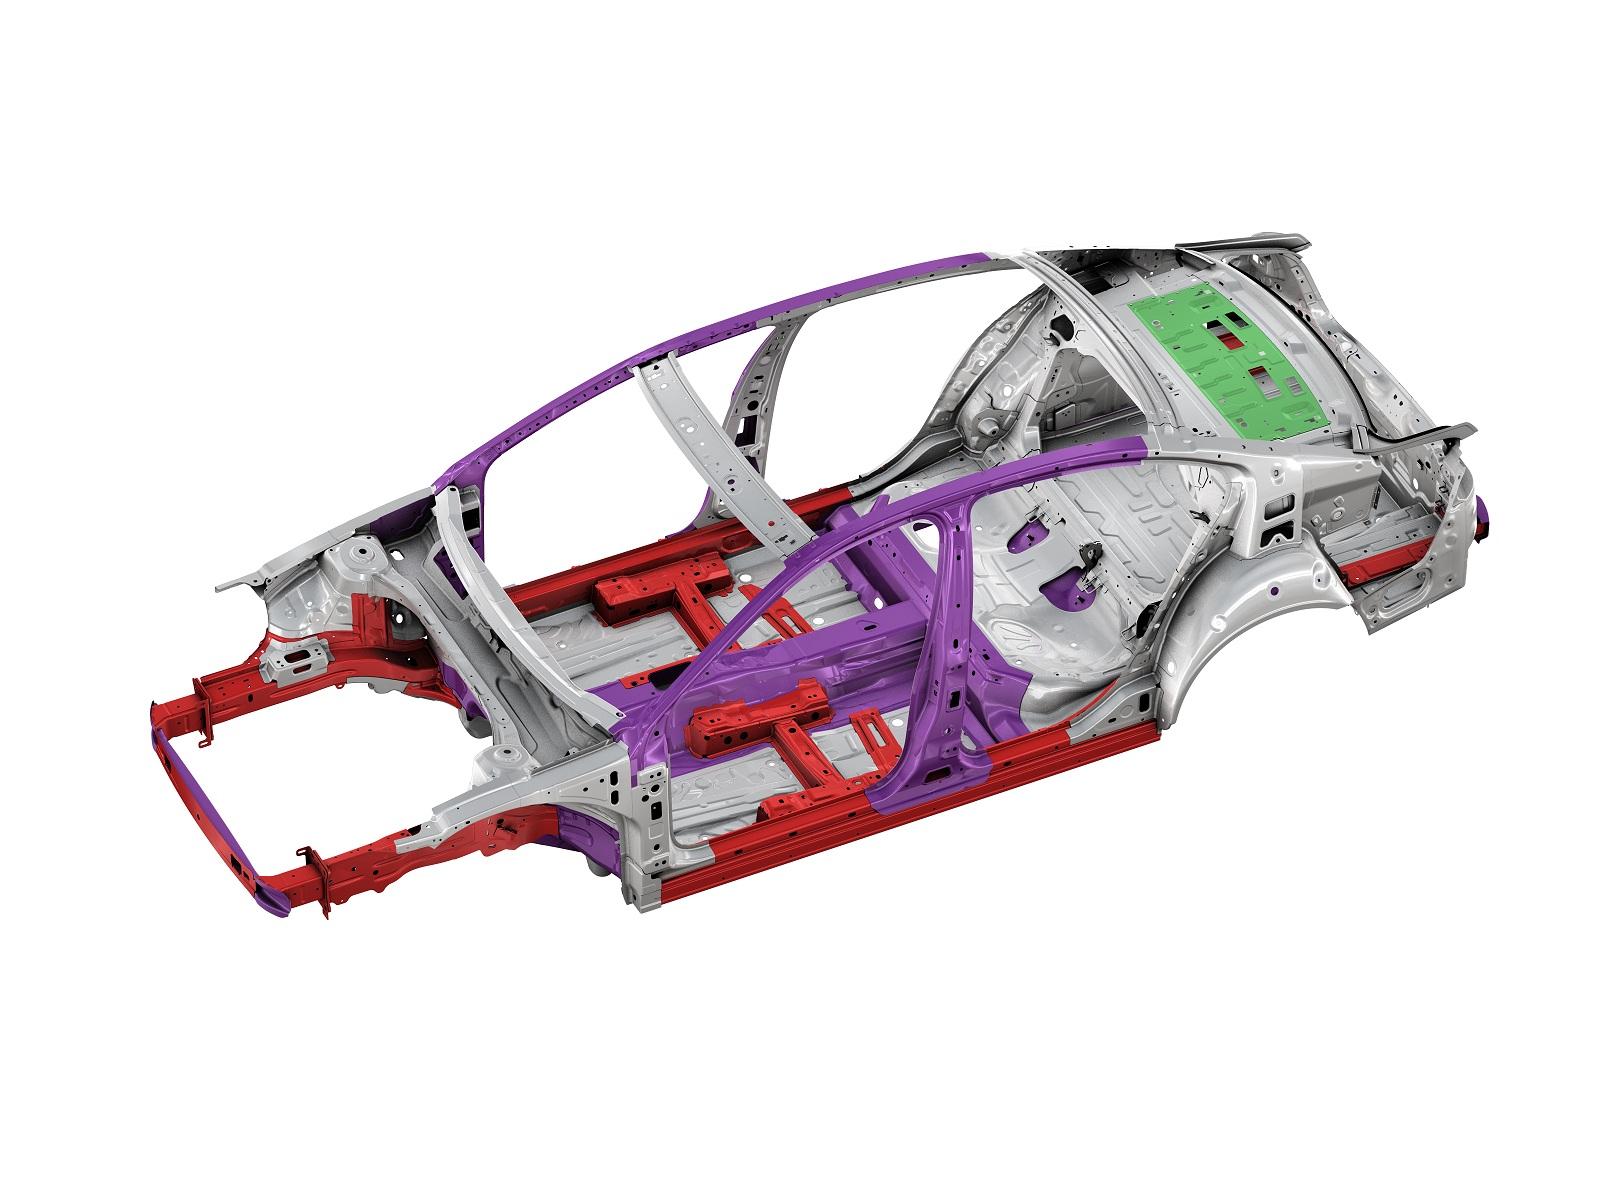 Lightweight structure of the New Passat